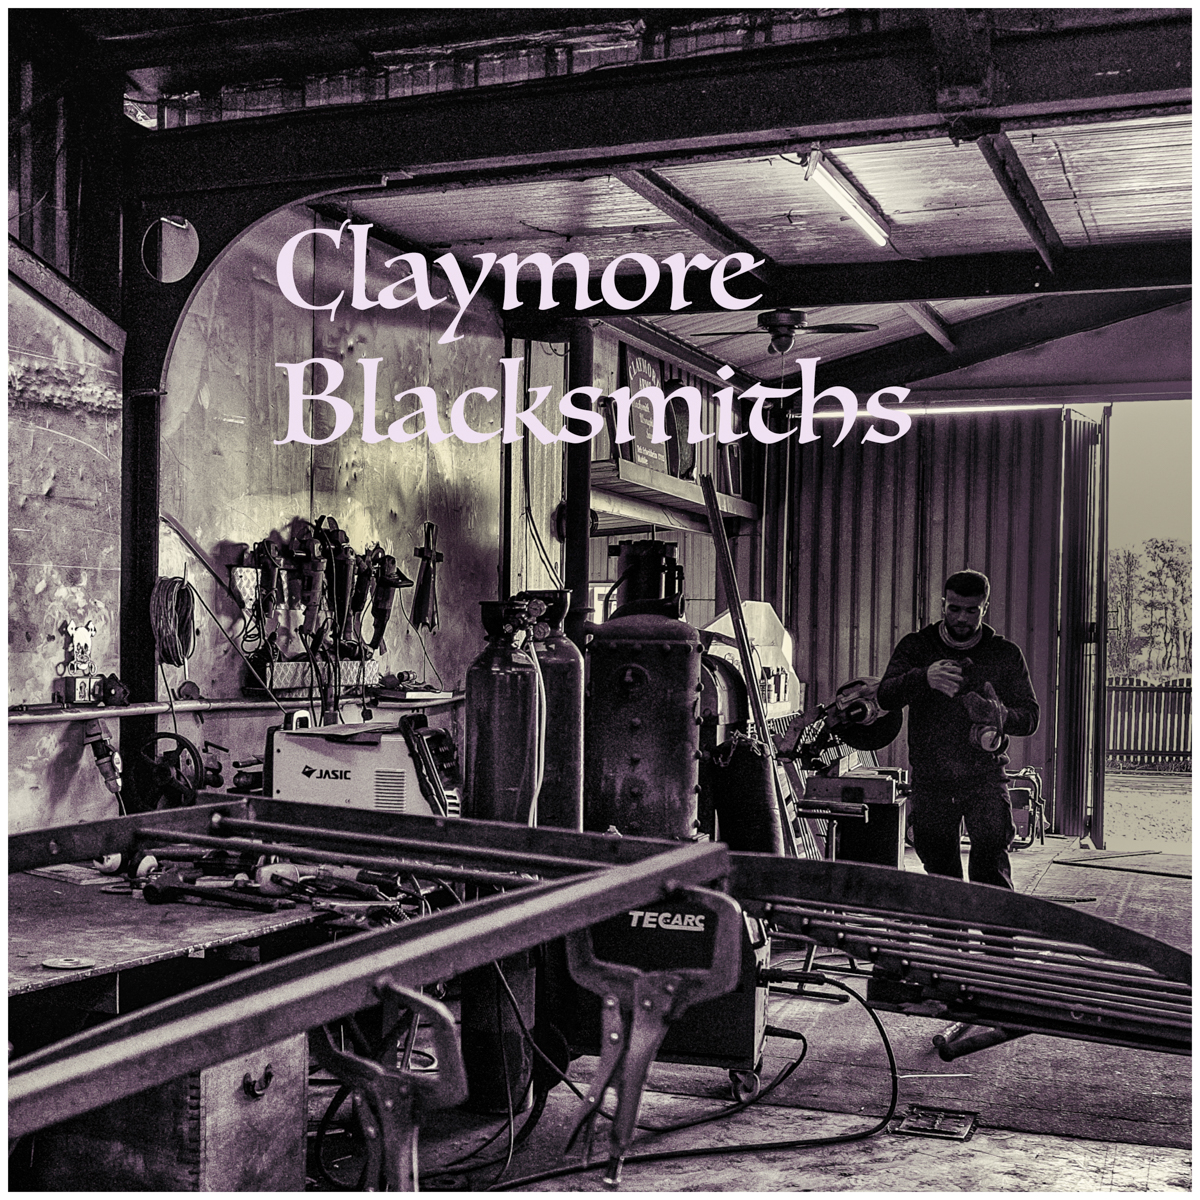 15-01 Claymore Blacksmiths title photo